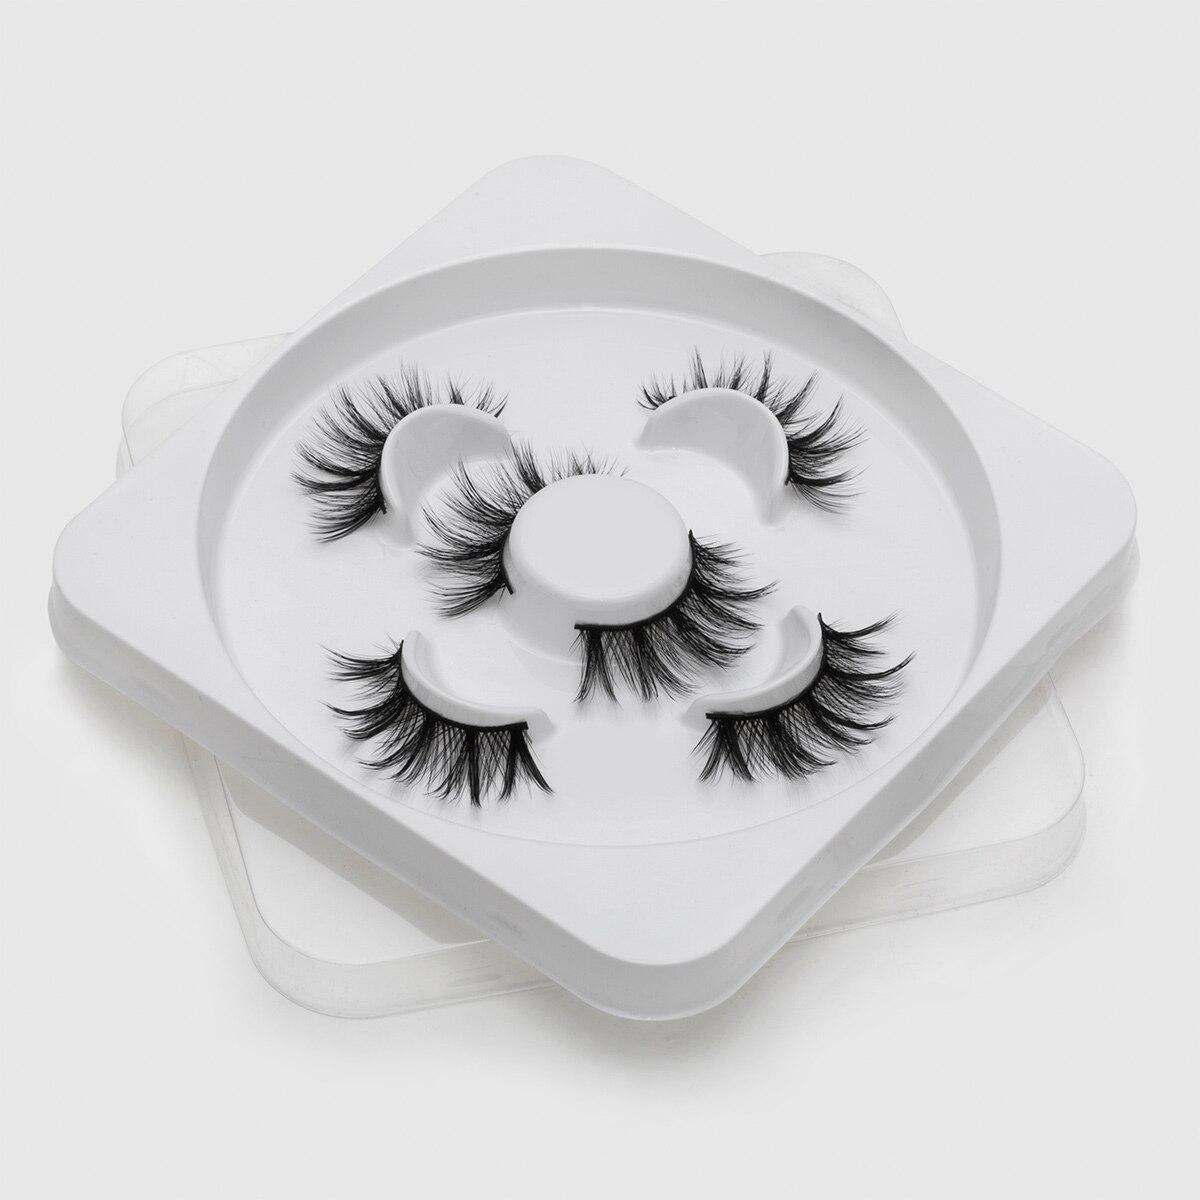 3 PairsMink Eyelashes 3D False Lashes Thick Crisscross Makeup Eyelash Extension Natural Volume Soft Fake Eye Lashes